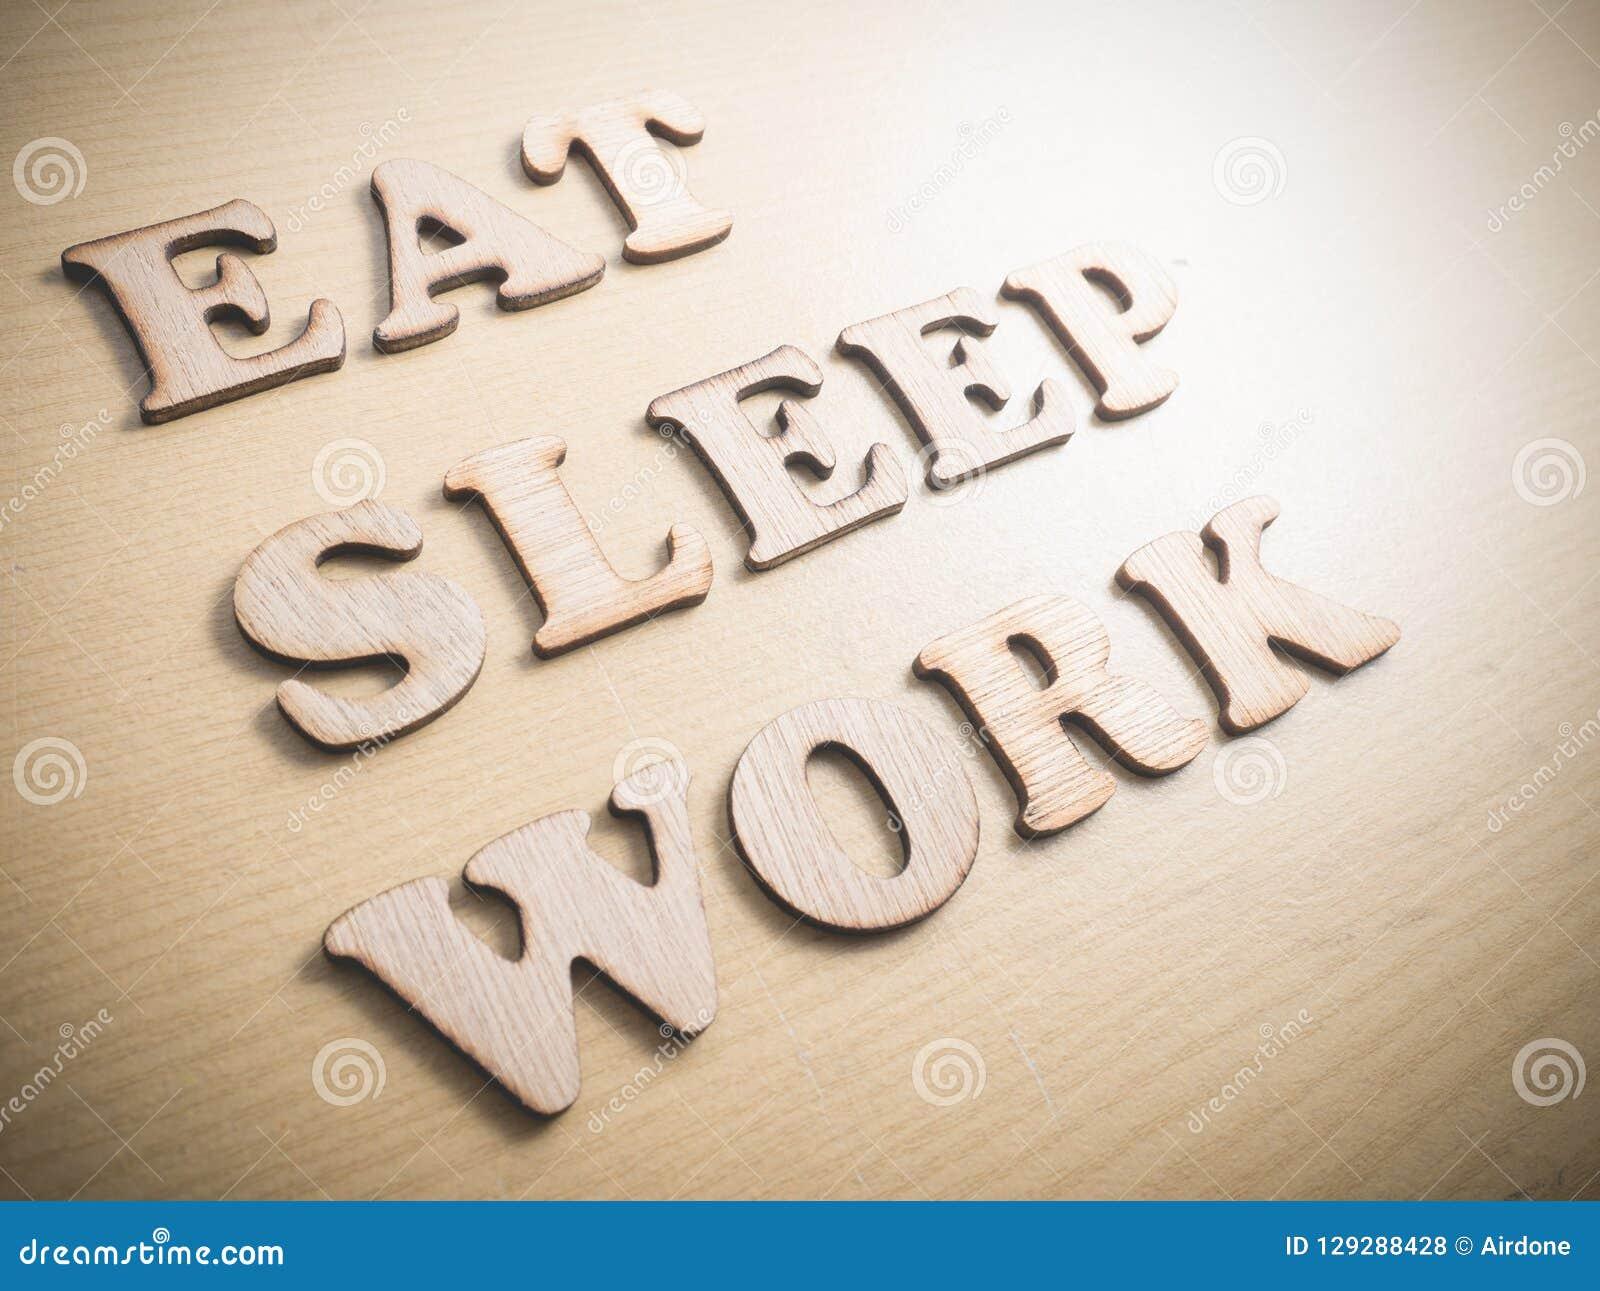 Eat Sleep Work Motivational Words Quotes Concept Stock Photo